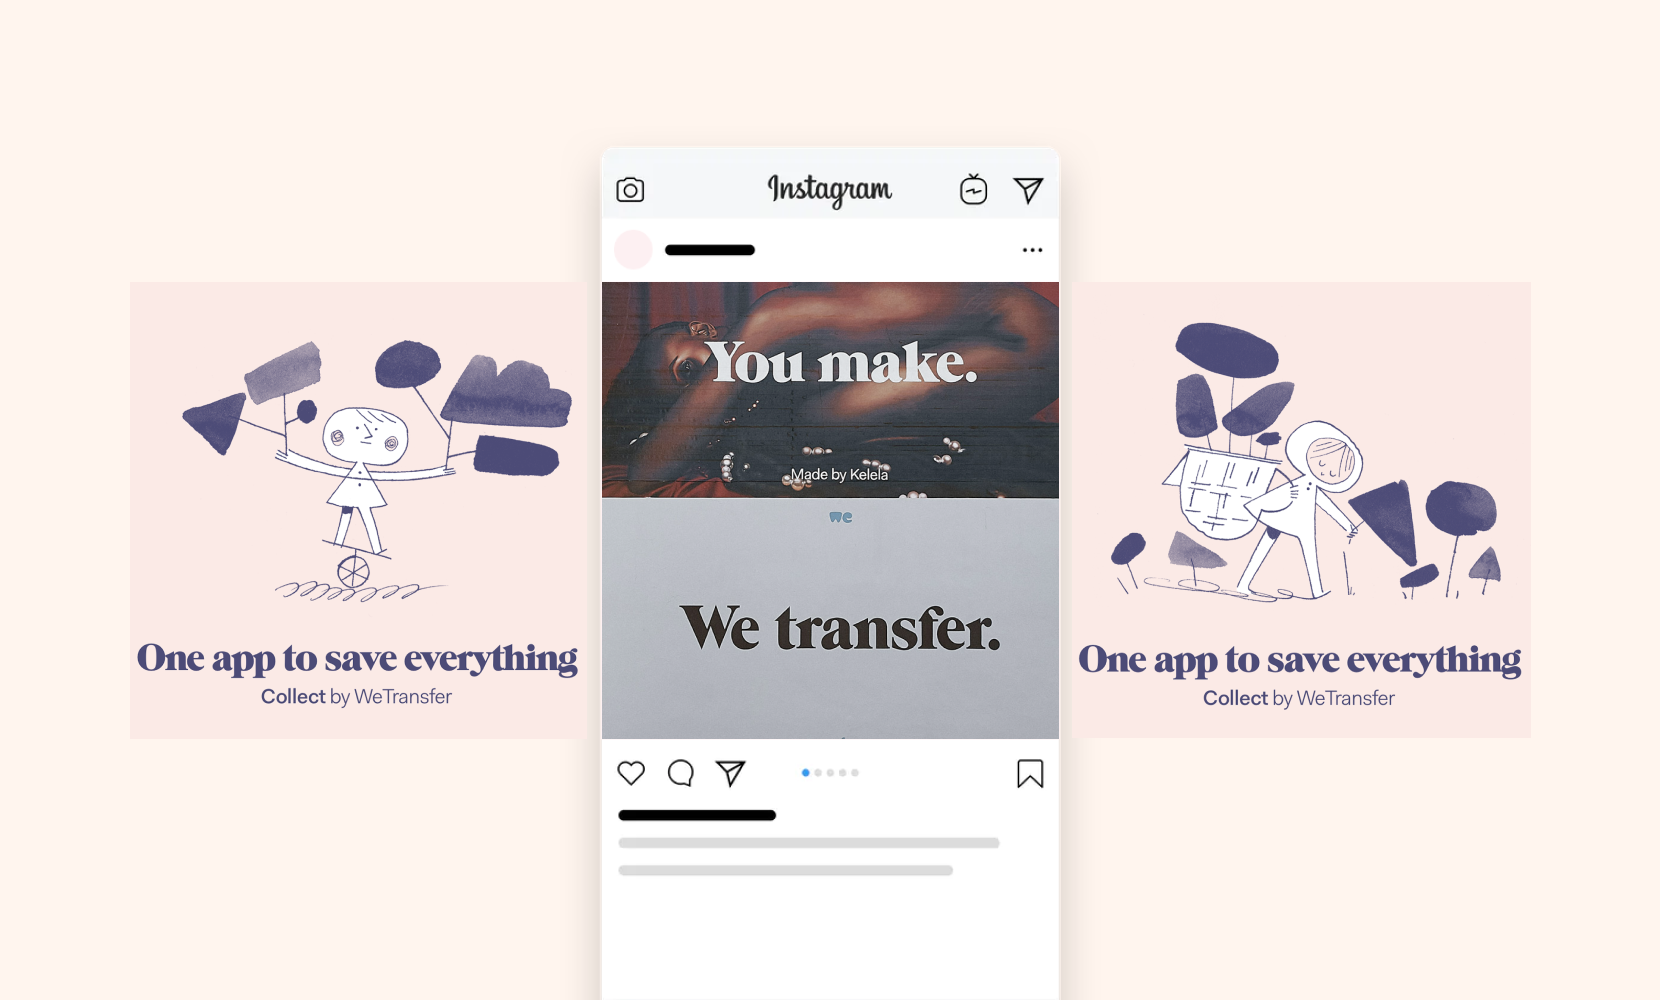 wetransfer app tech ads design inspiration